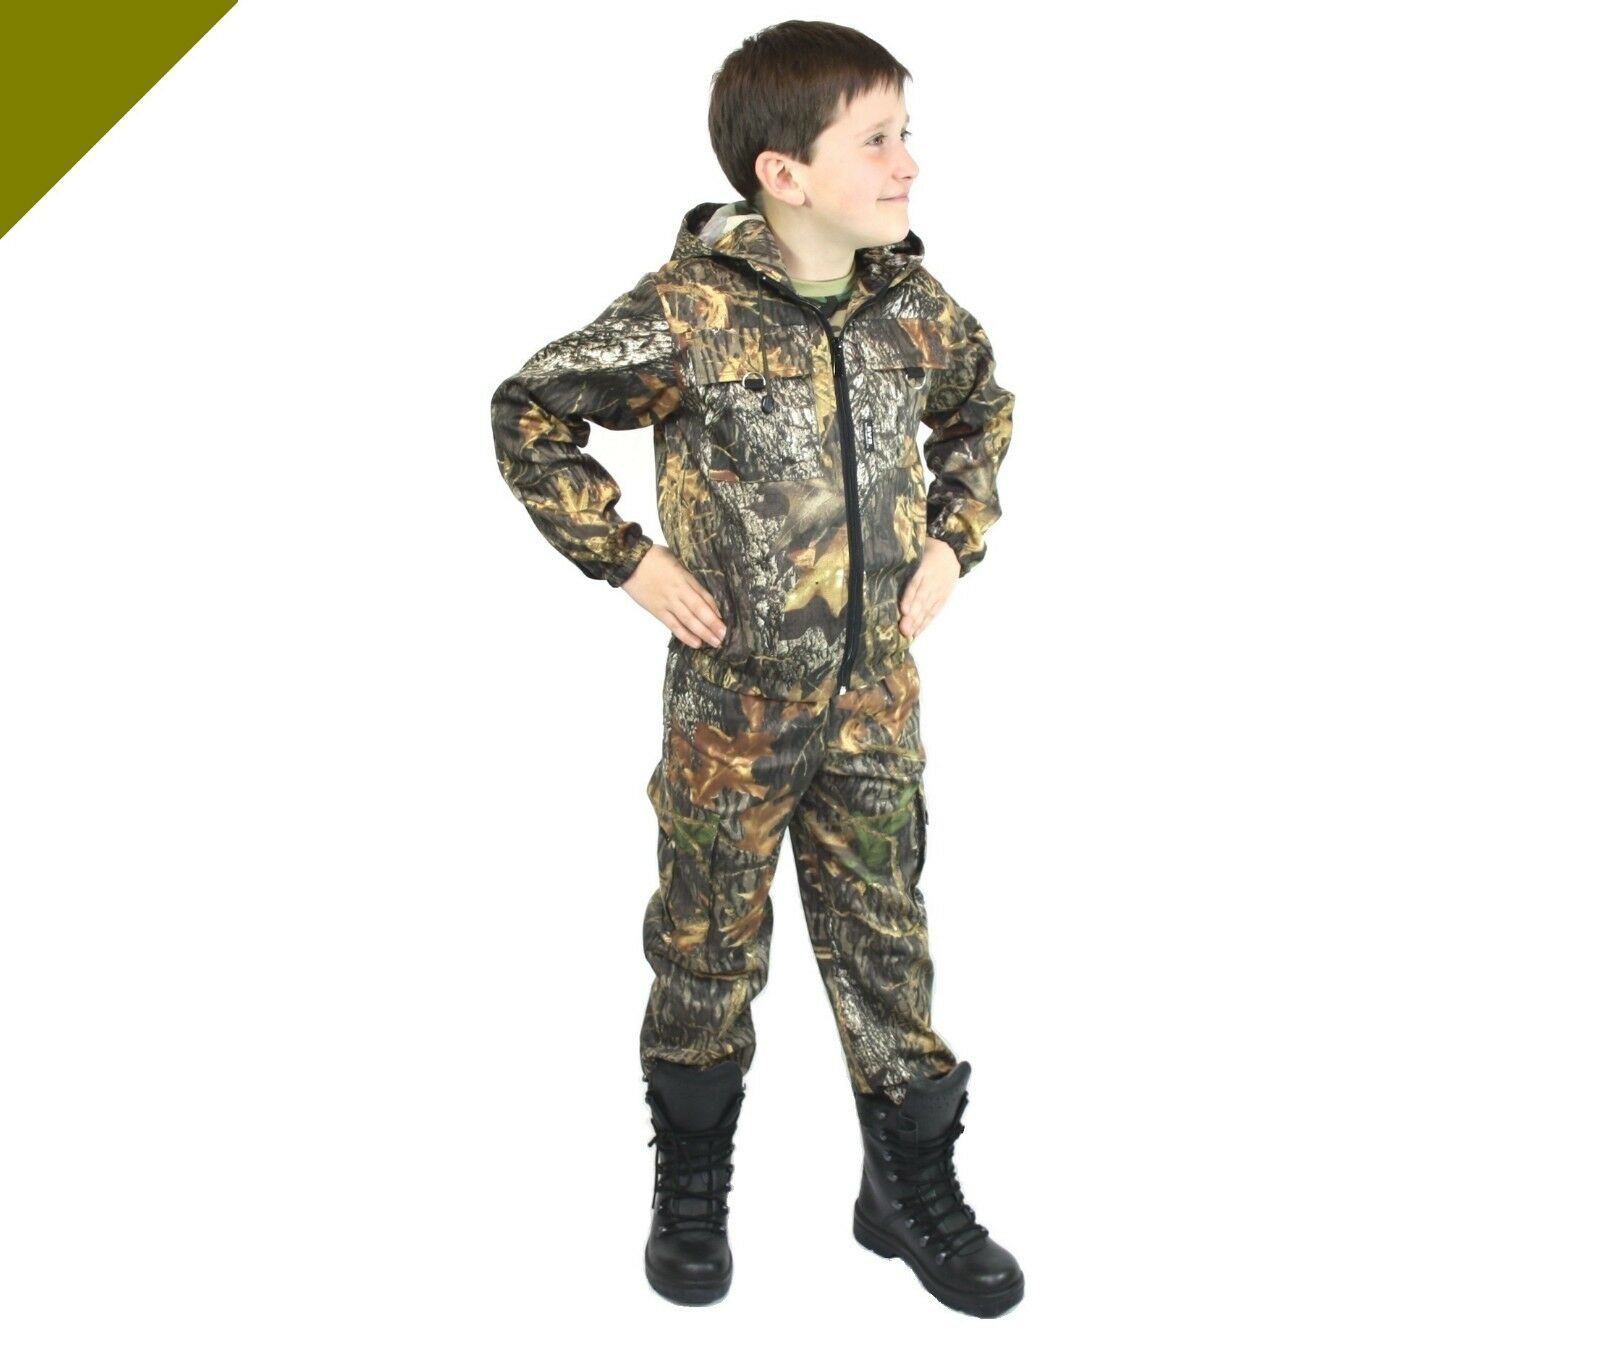 TUTA Pantaloni Giacca foresta bambini bambini foresta adolescenti a pesca outdoor migratori Paintball Tarn 6a035c